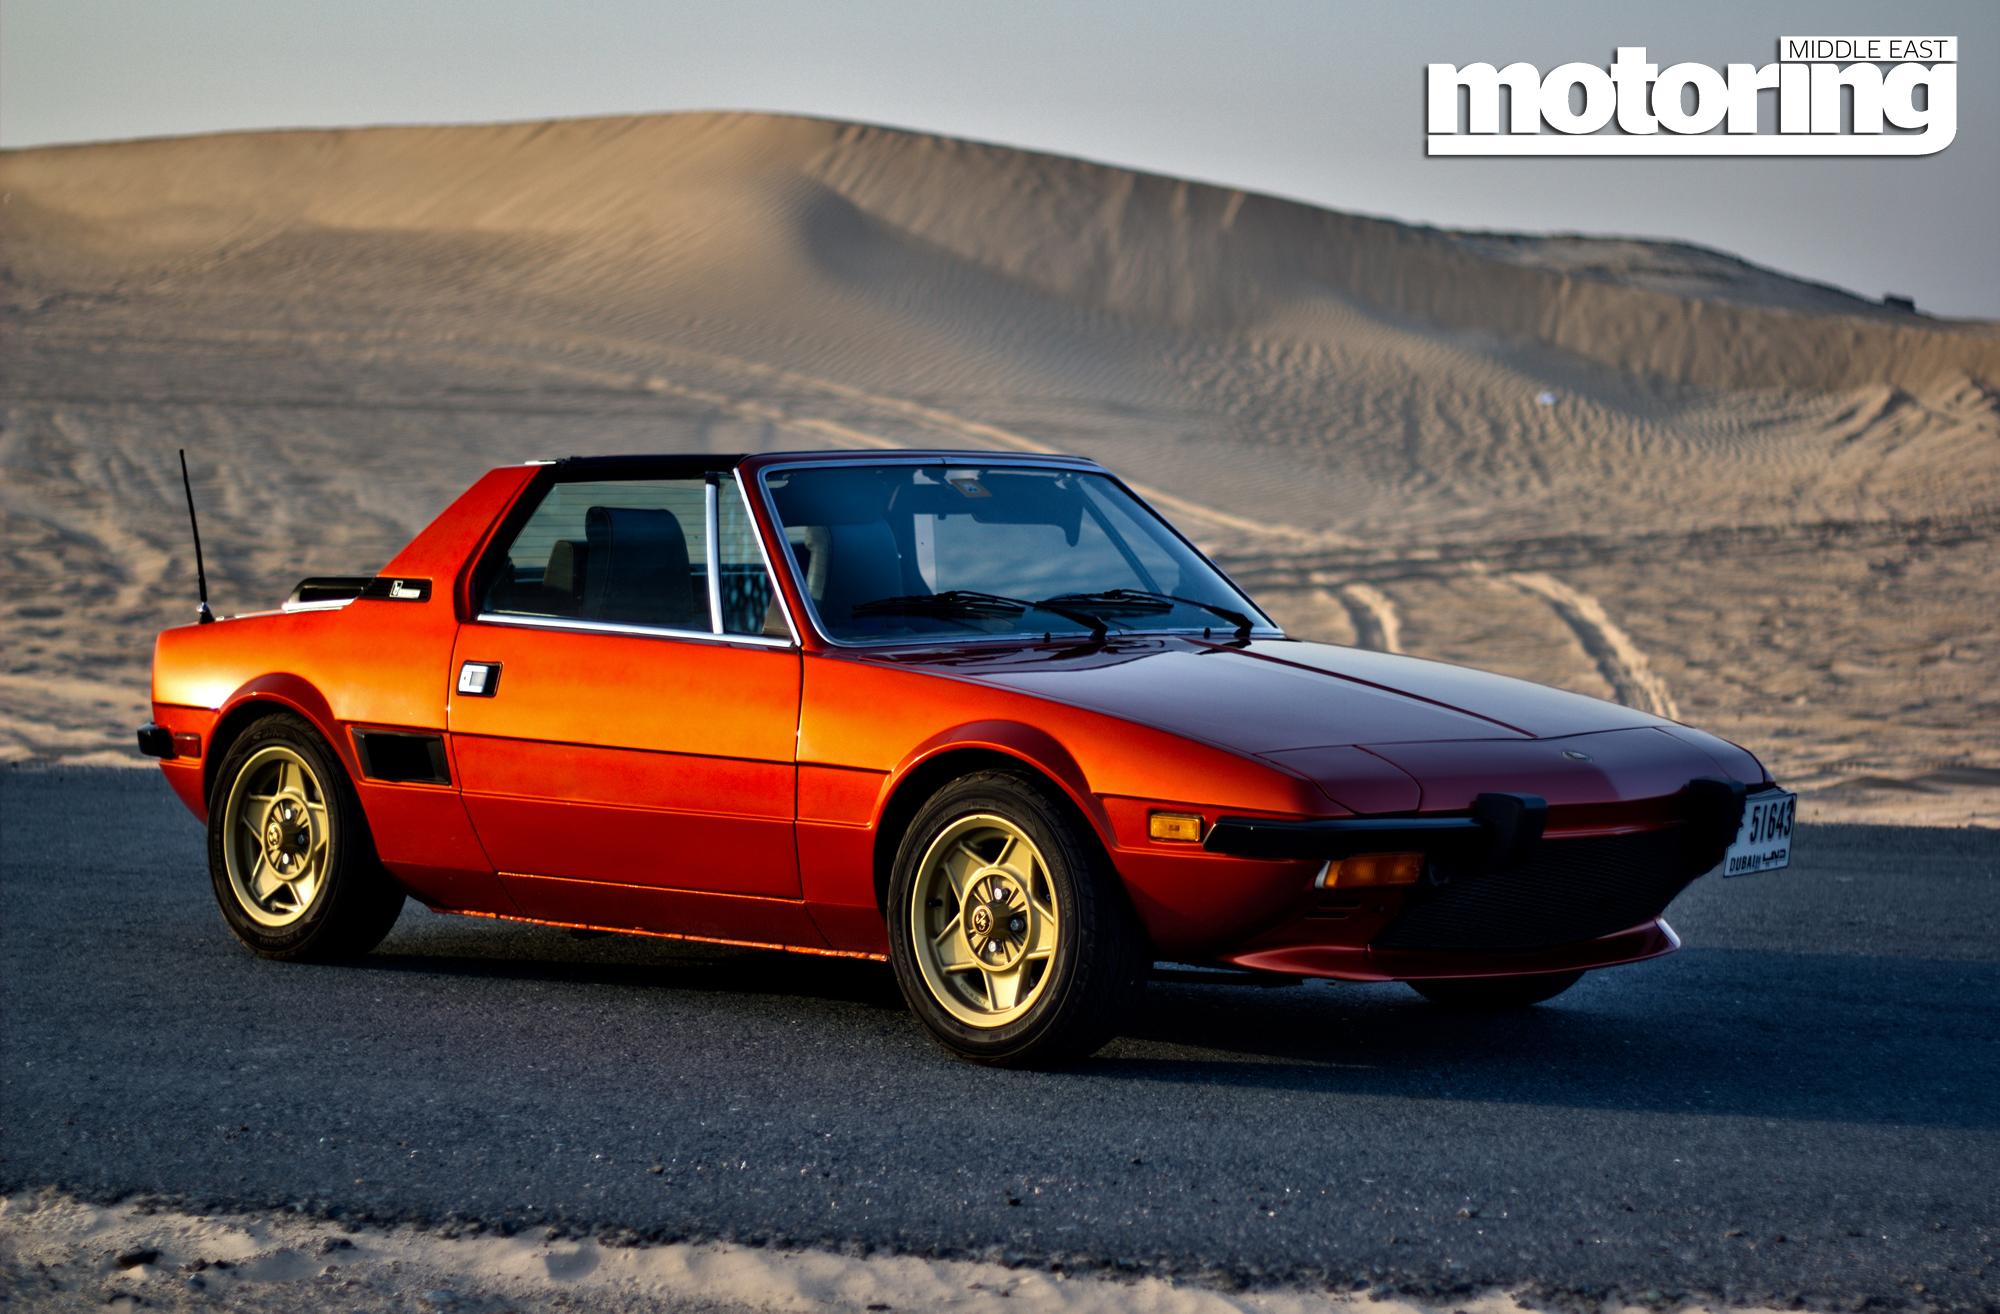 1980 fiat x1 9 motoring middle east car news reviews. Black Bedroom Furniture Sets. Home Design Ideas